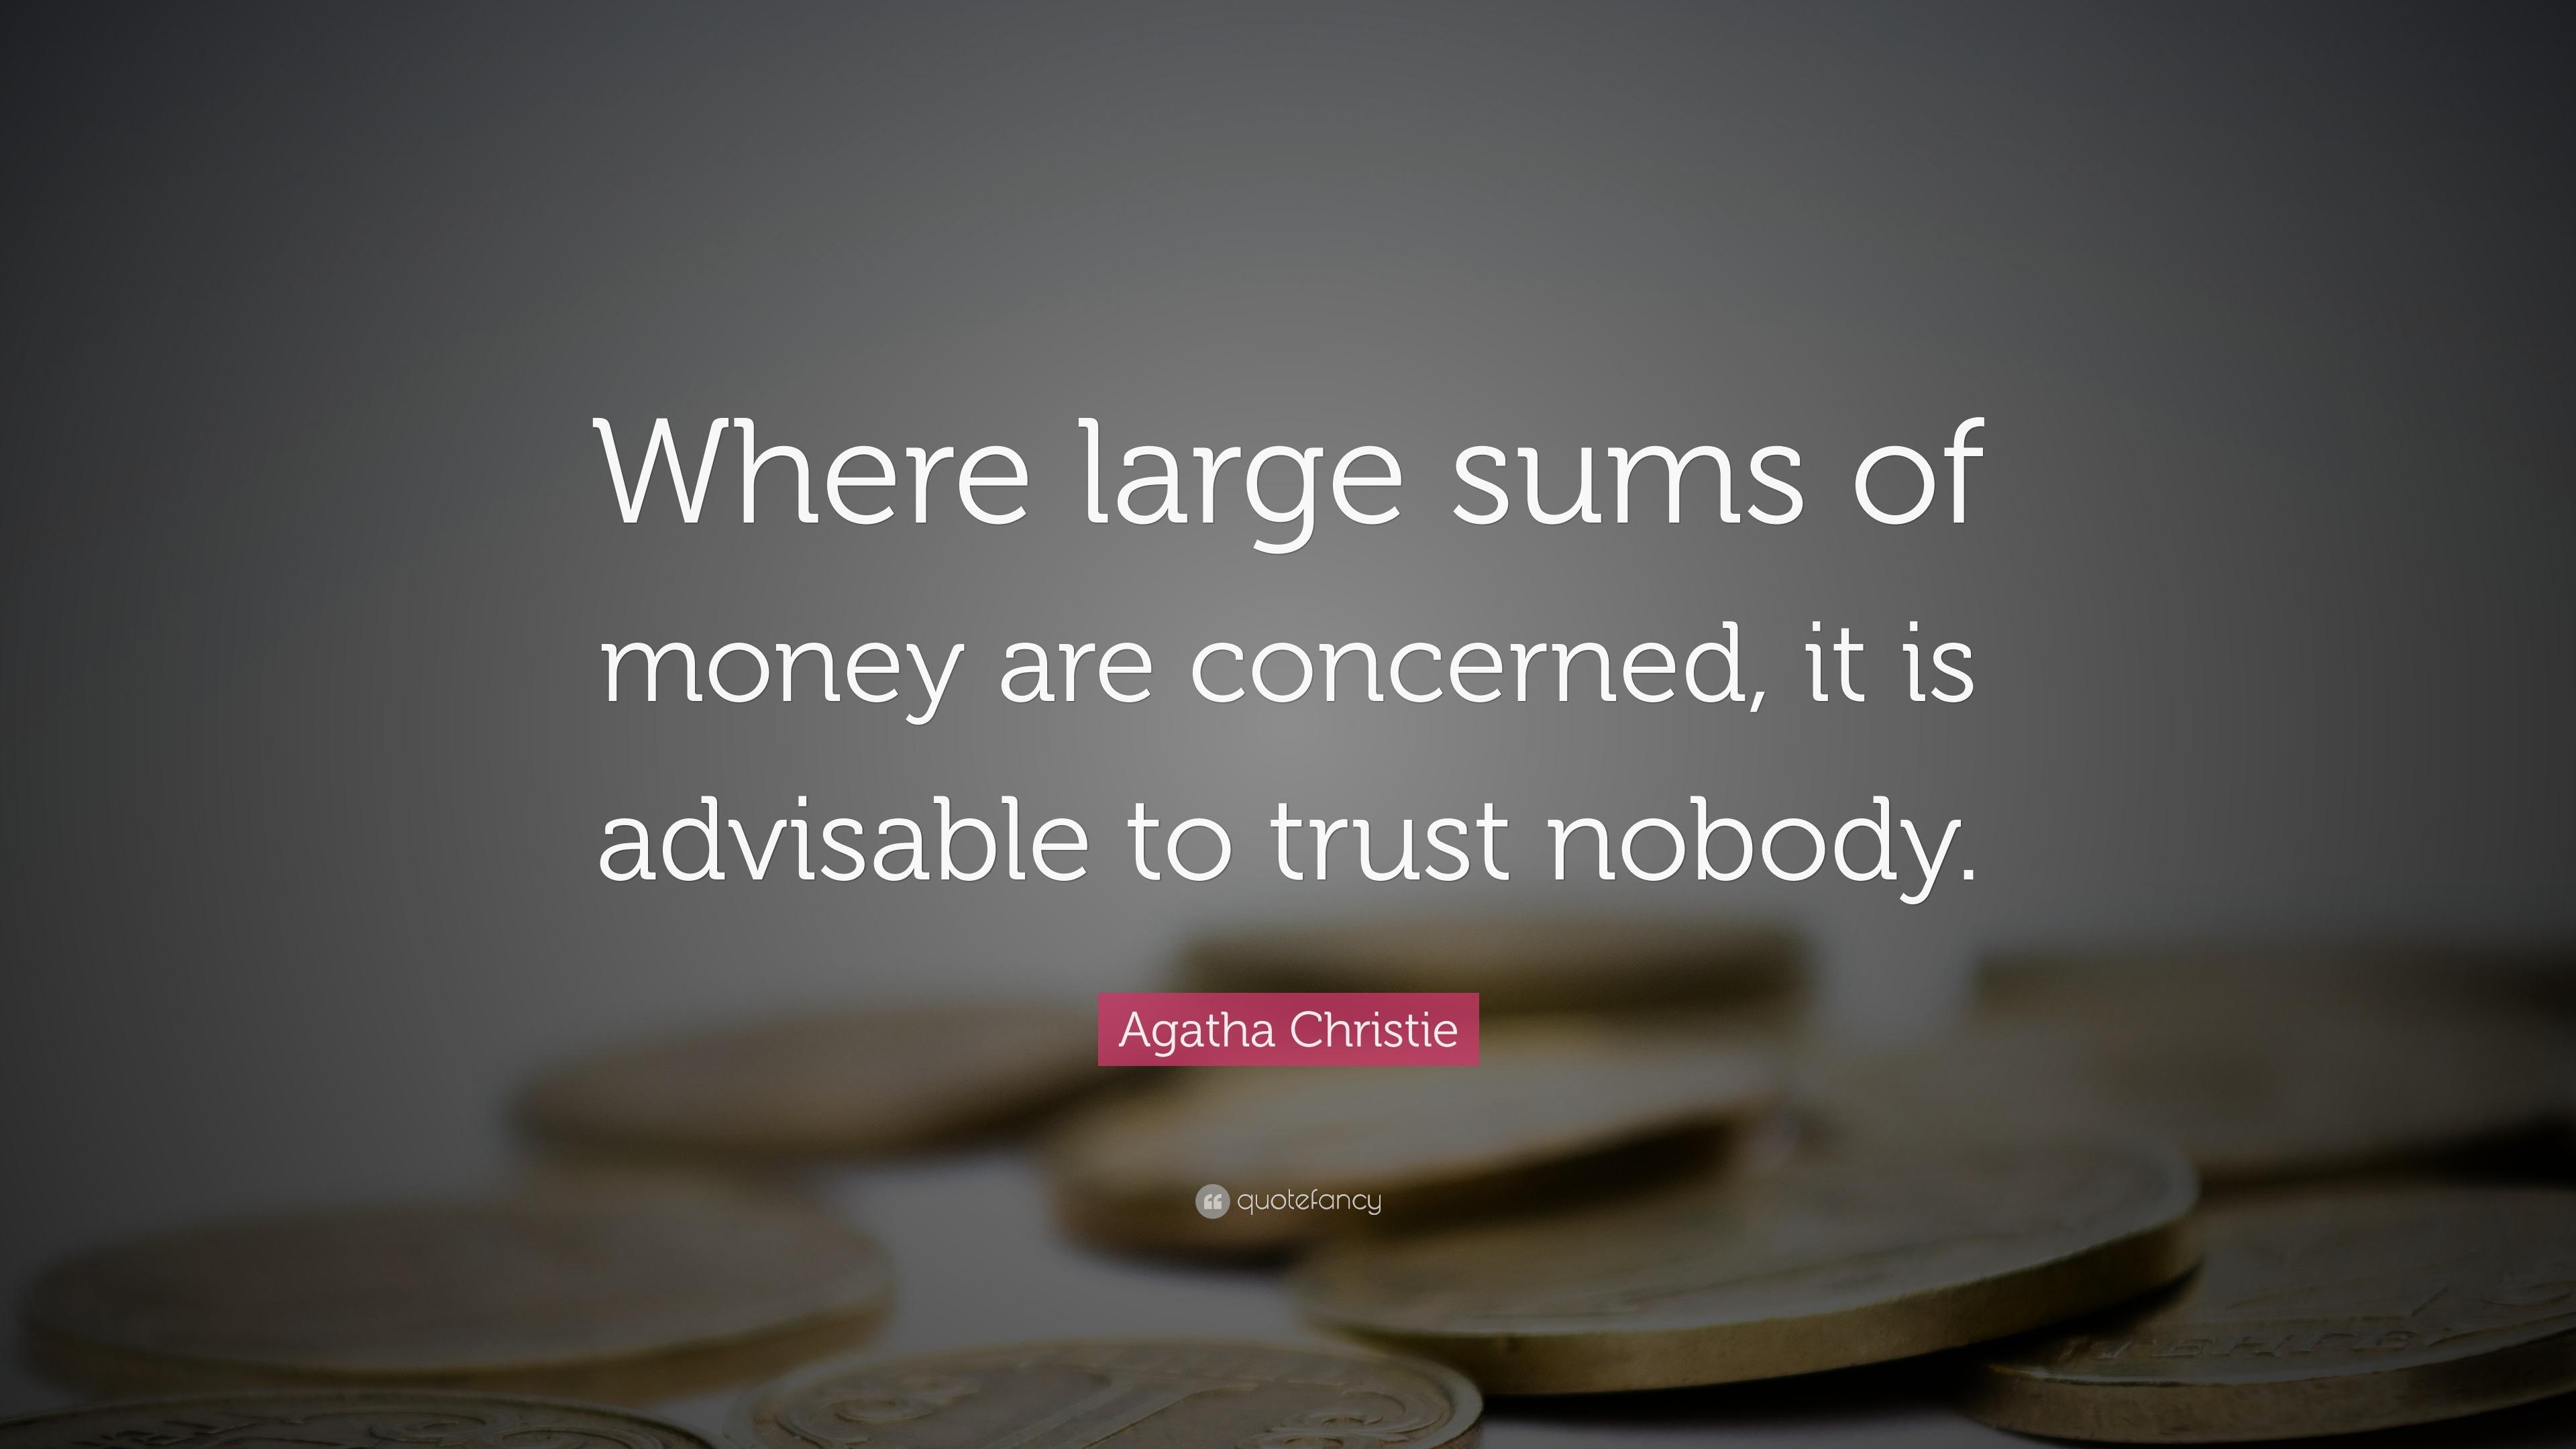 Success Quotes Desktop Wallpaper Quotes About Trust 44 Wallpapers Quotefancy